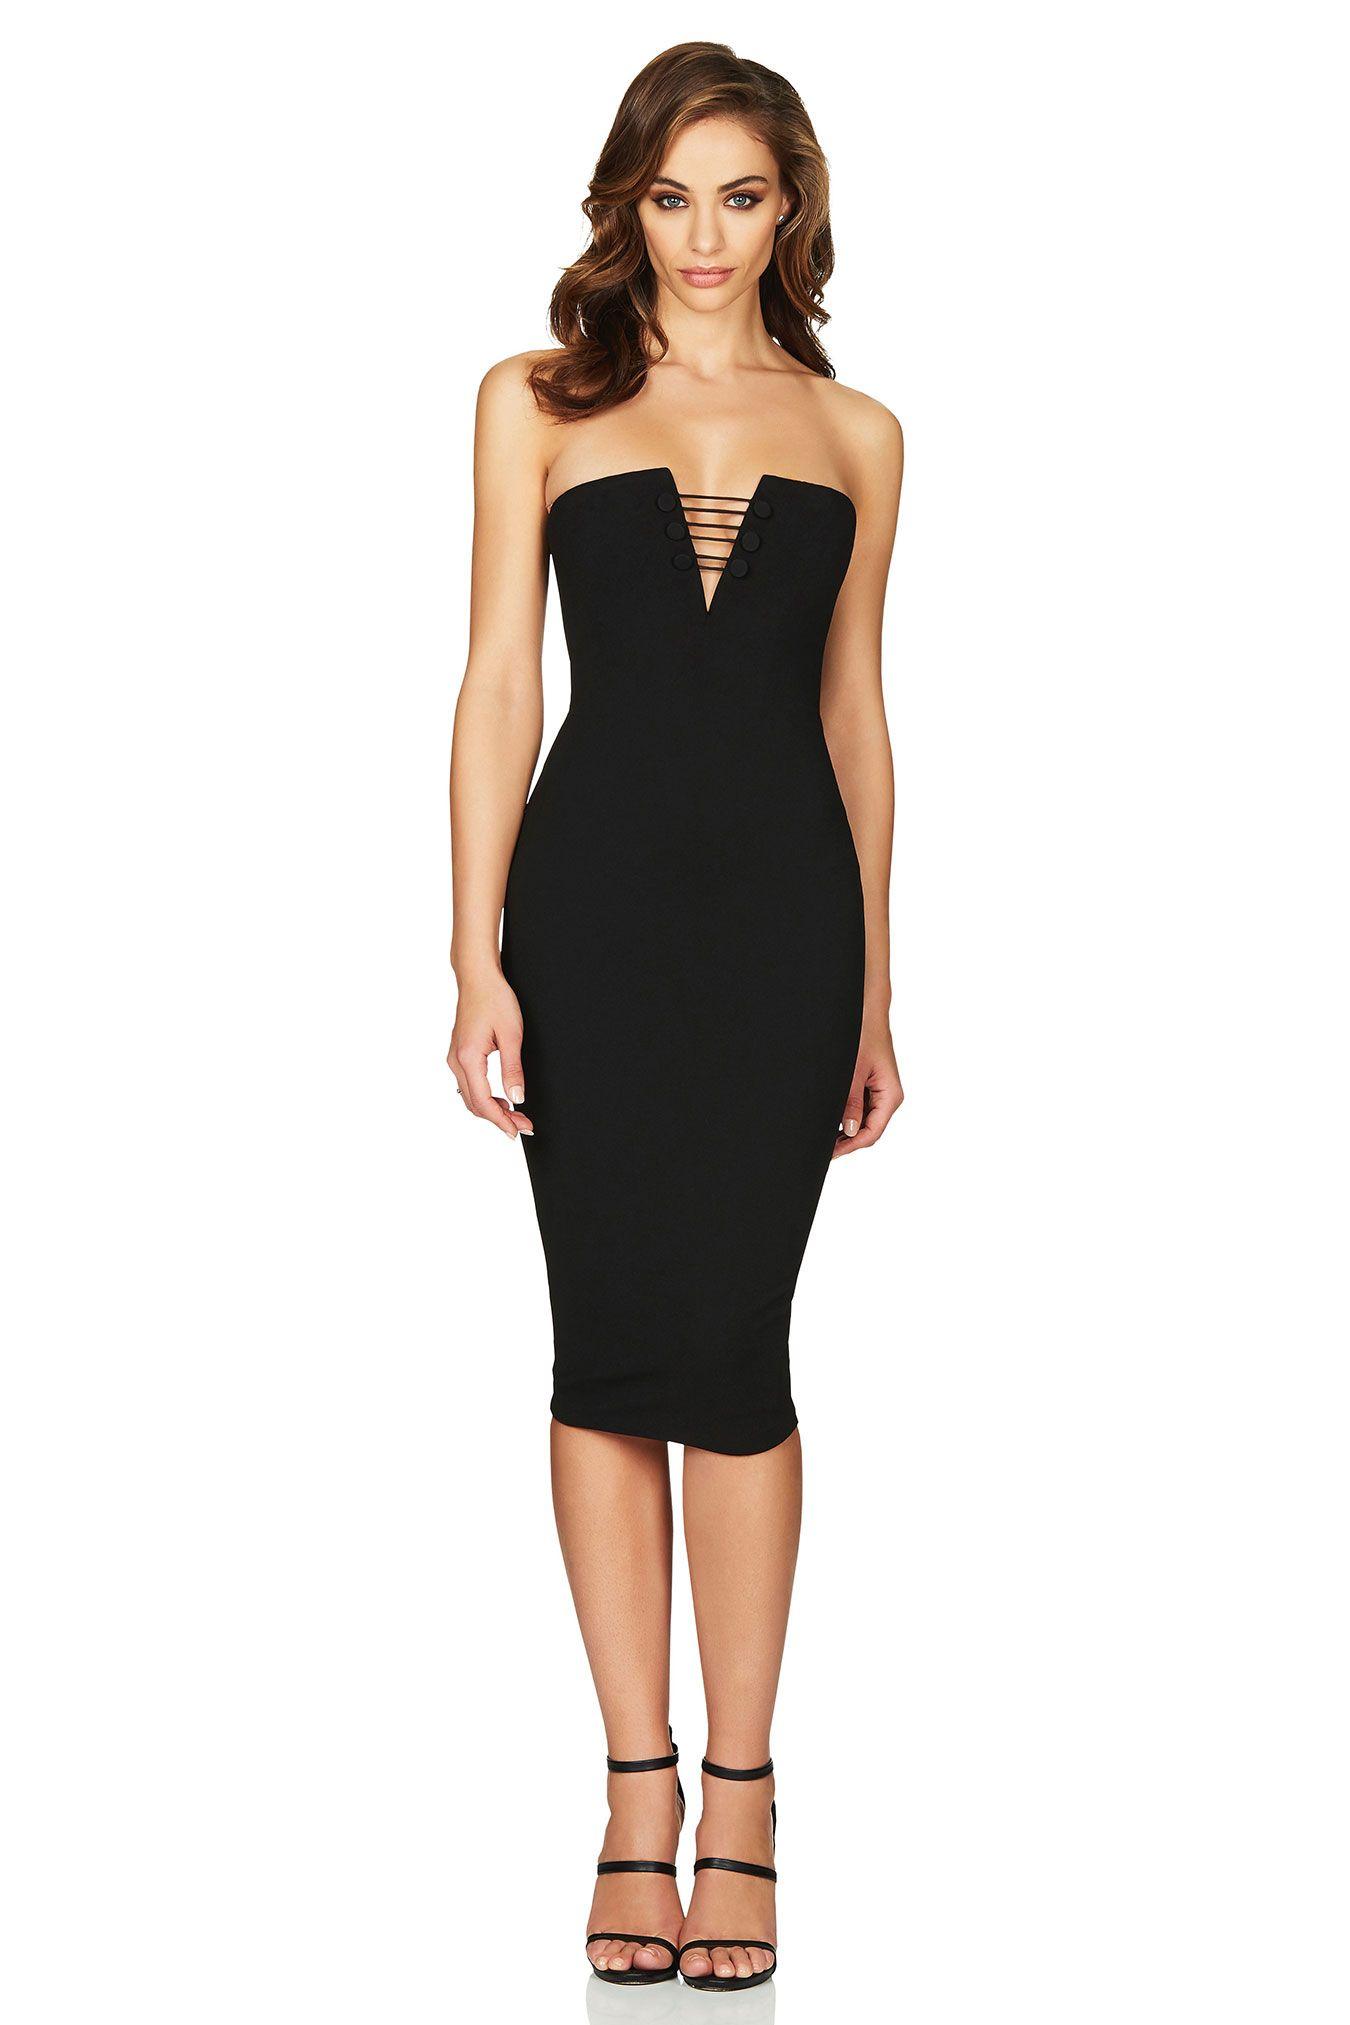 Black Juliette Midi Buy Designer Dresses Online At Nookie Designer Dresses Online Strapless Midi Dress Fashion [ 2025 x 1350 Pixel ]